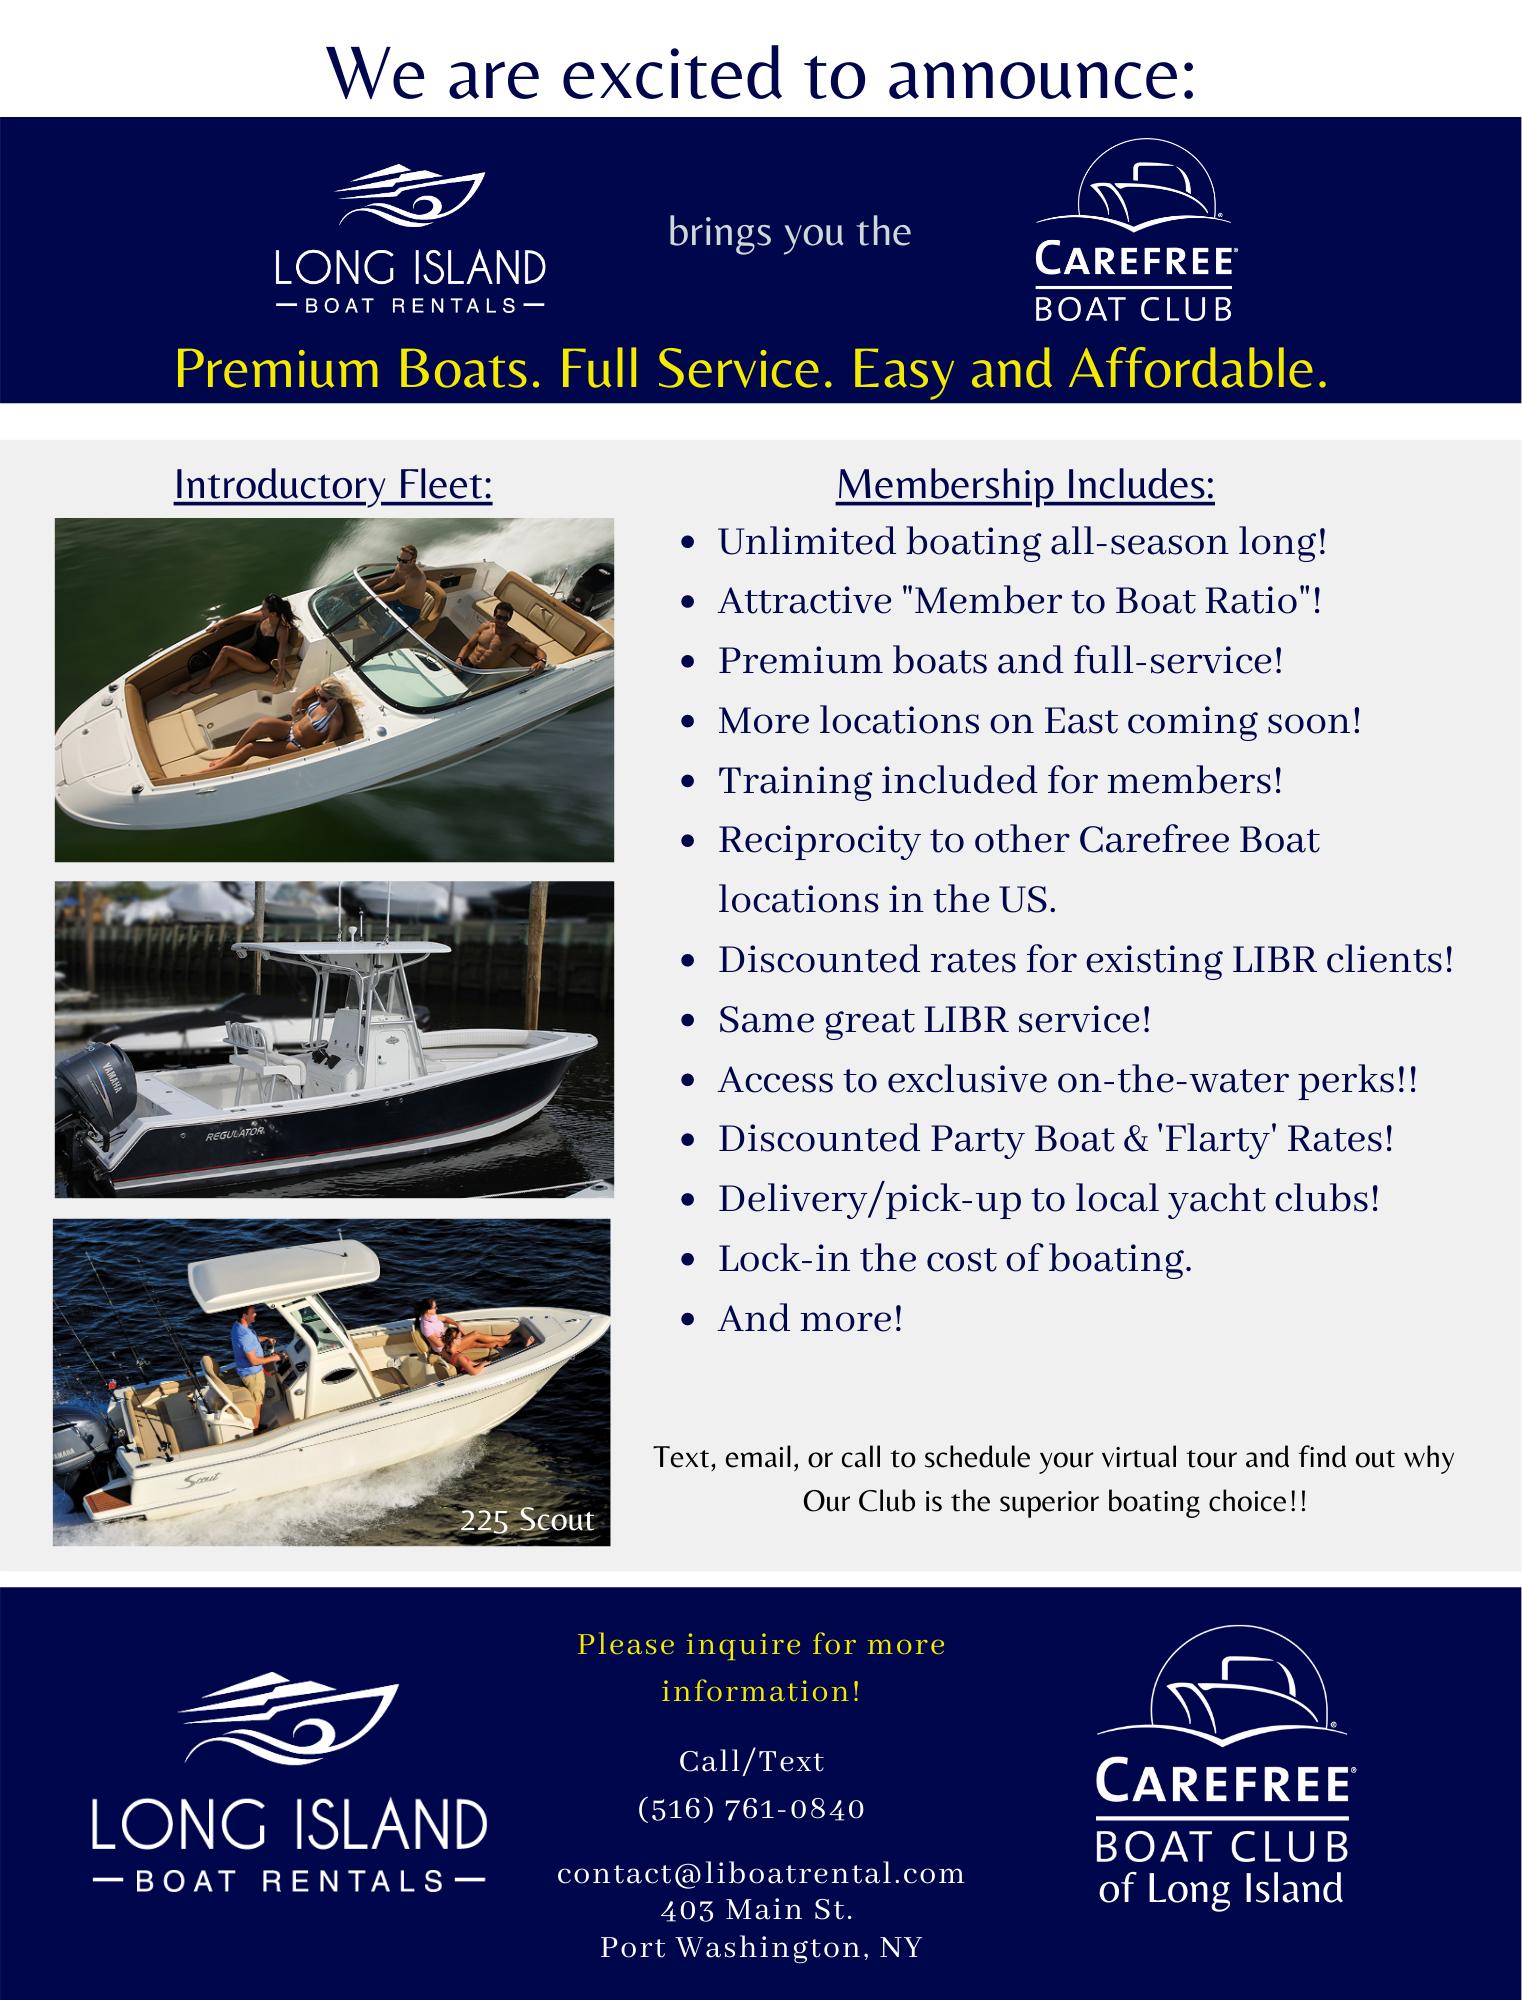 2021 Carefree Boat Club Membership Info